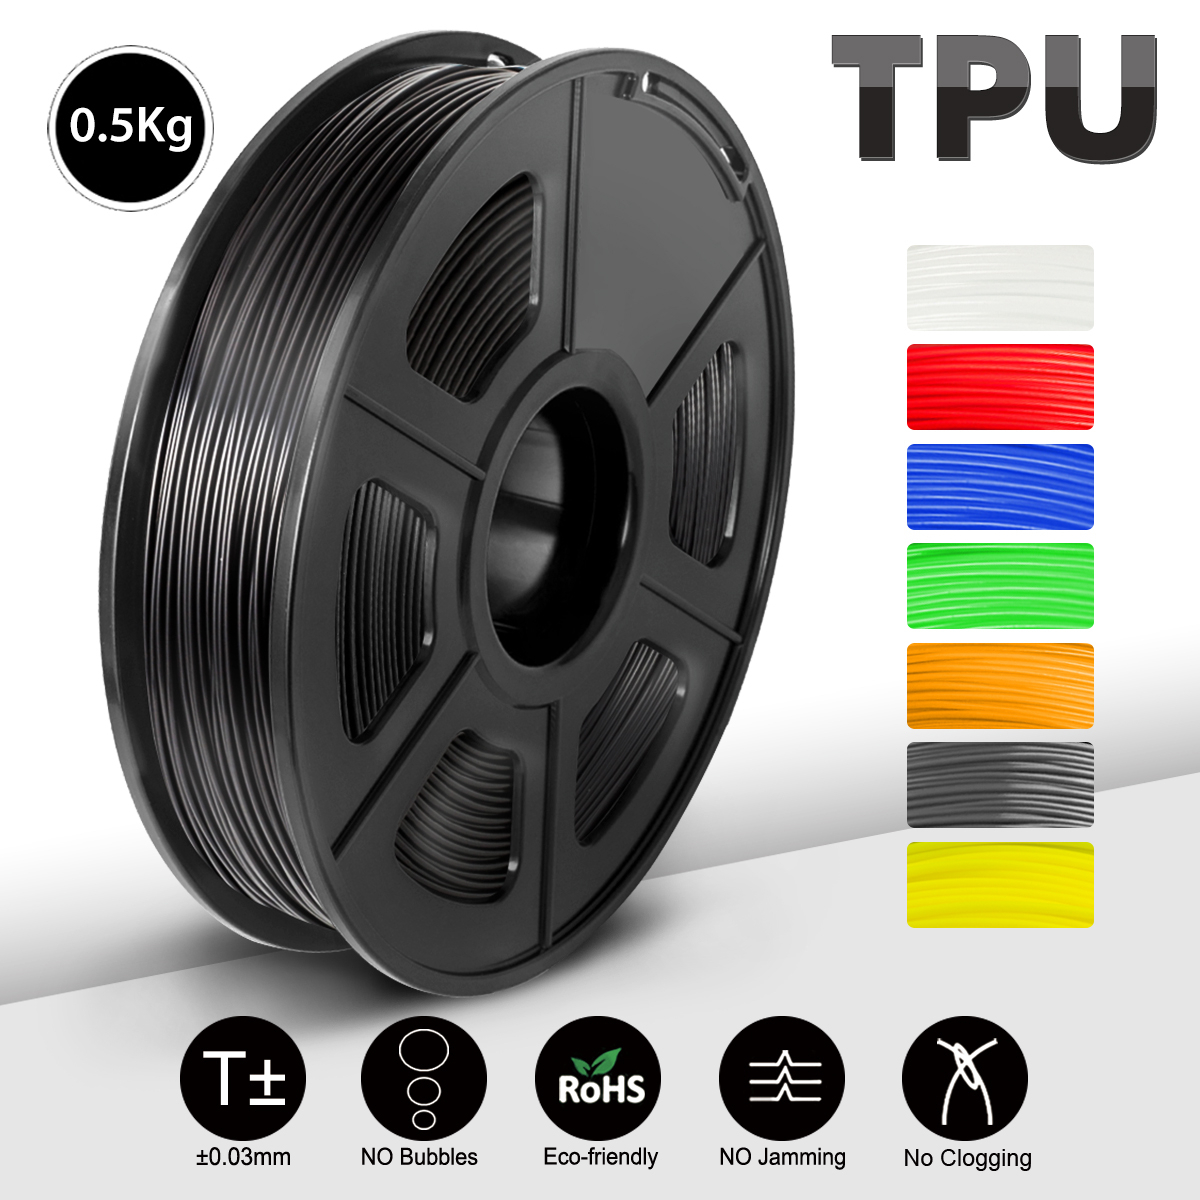 SUNLU 3D Druck Filament Schwarz Flexible TPU Filament 1,75mm 0,5 kg (1,1 LB) dimensional Genauigkeit +/-0,02 MM Shore 95A